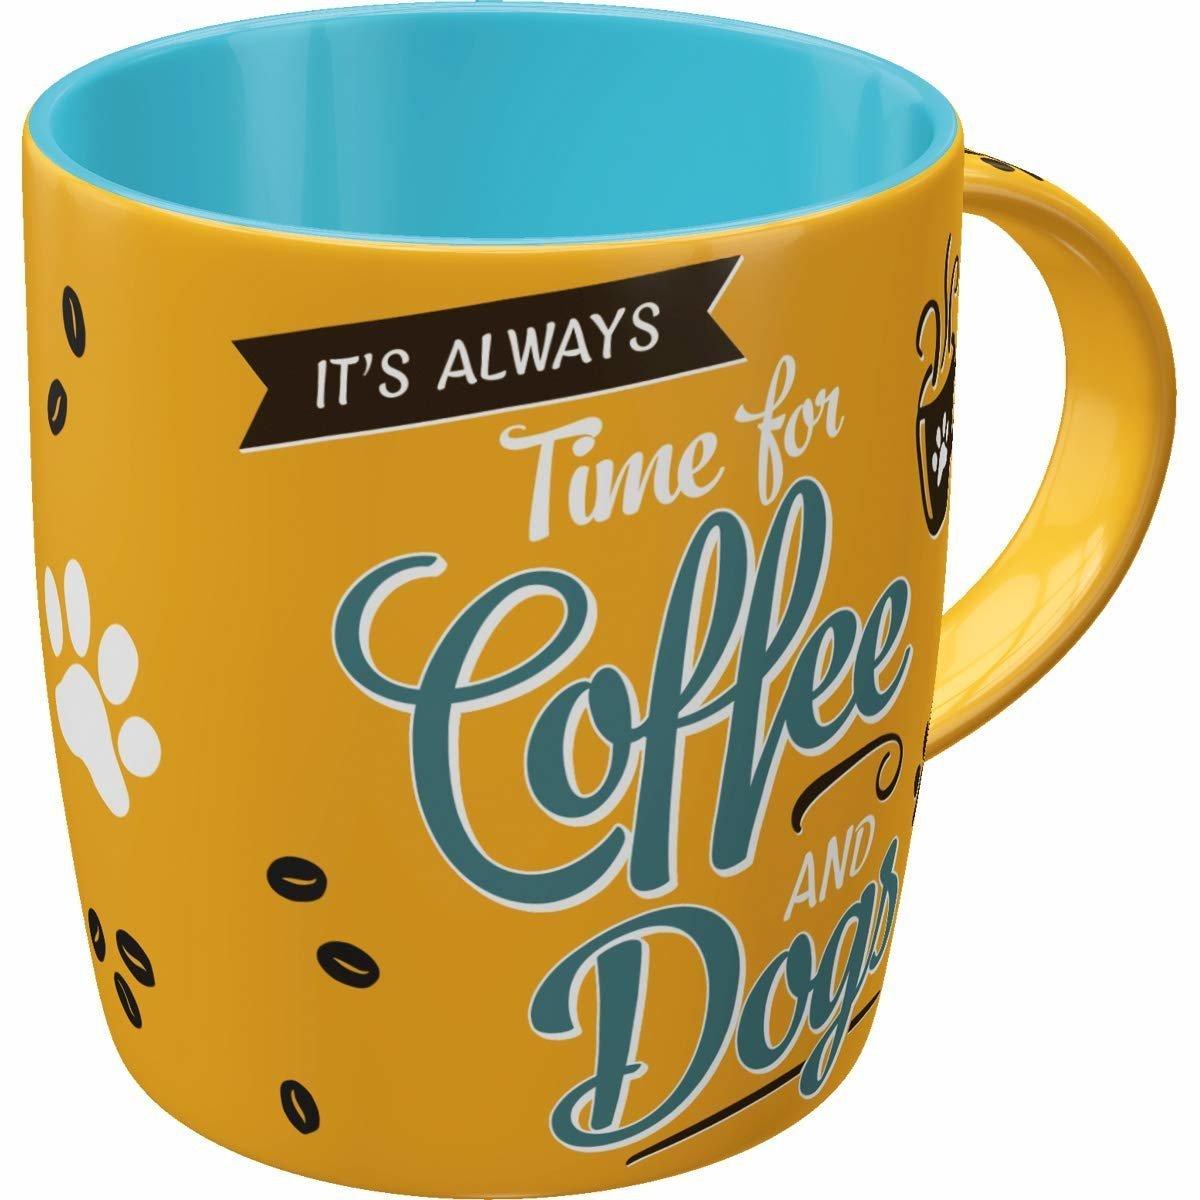 Nostalgic-Art Kaffebecher Coffee and Dogs, Bild 2